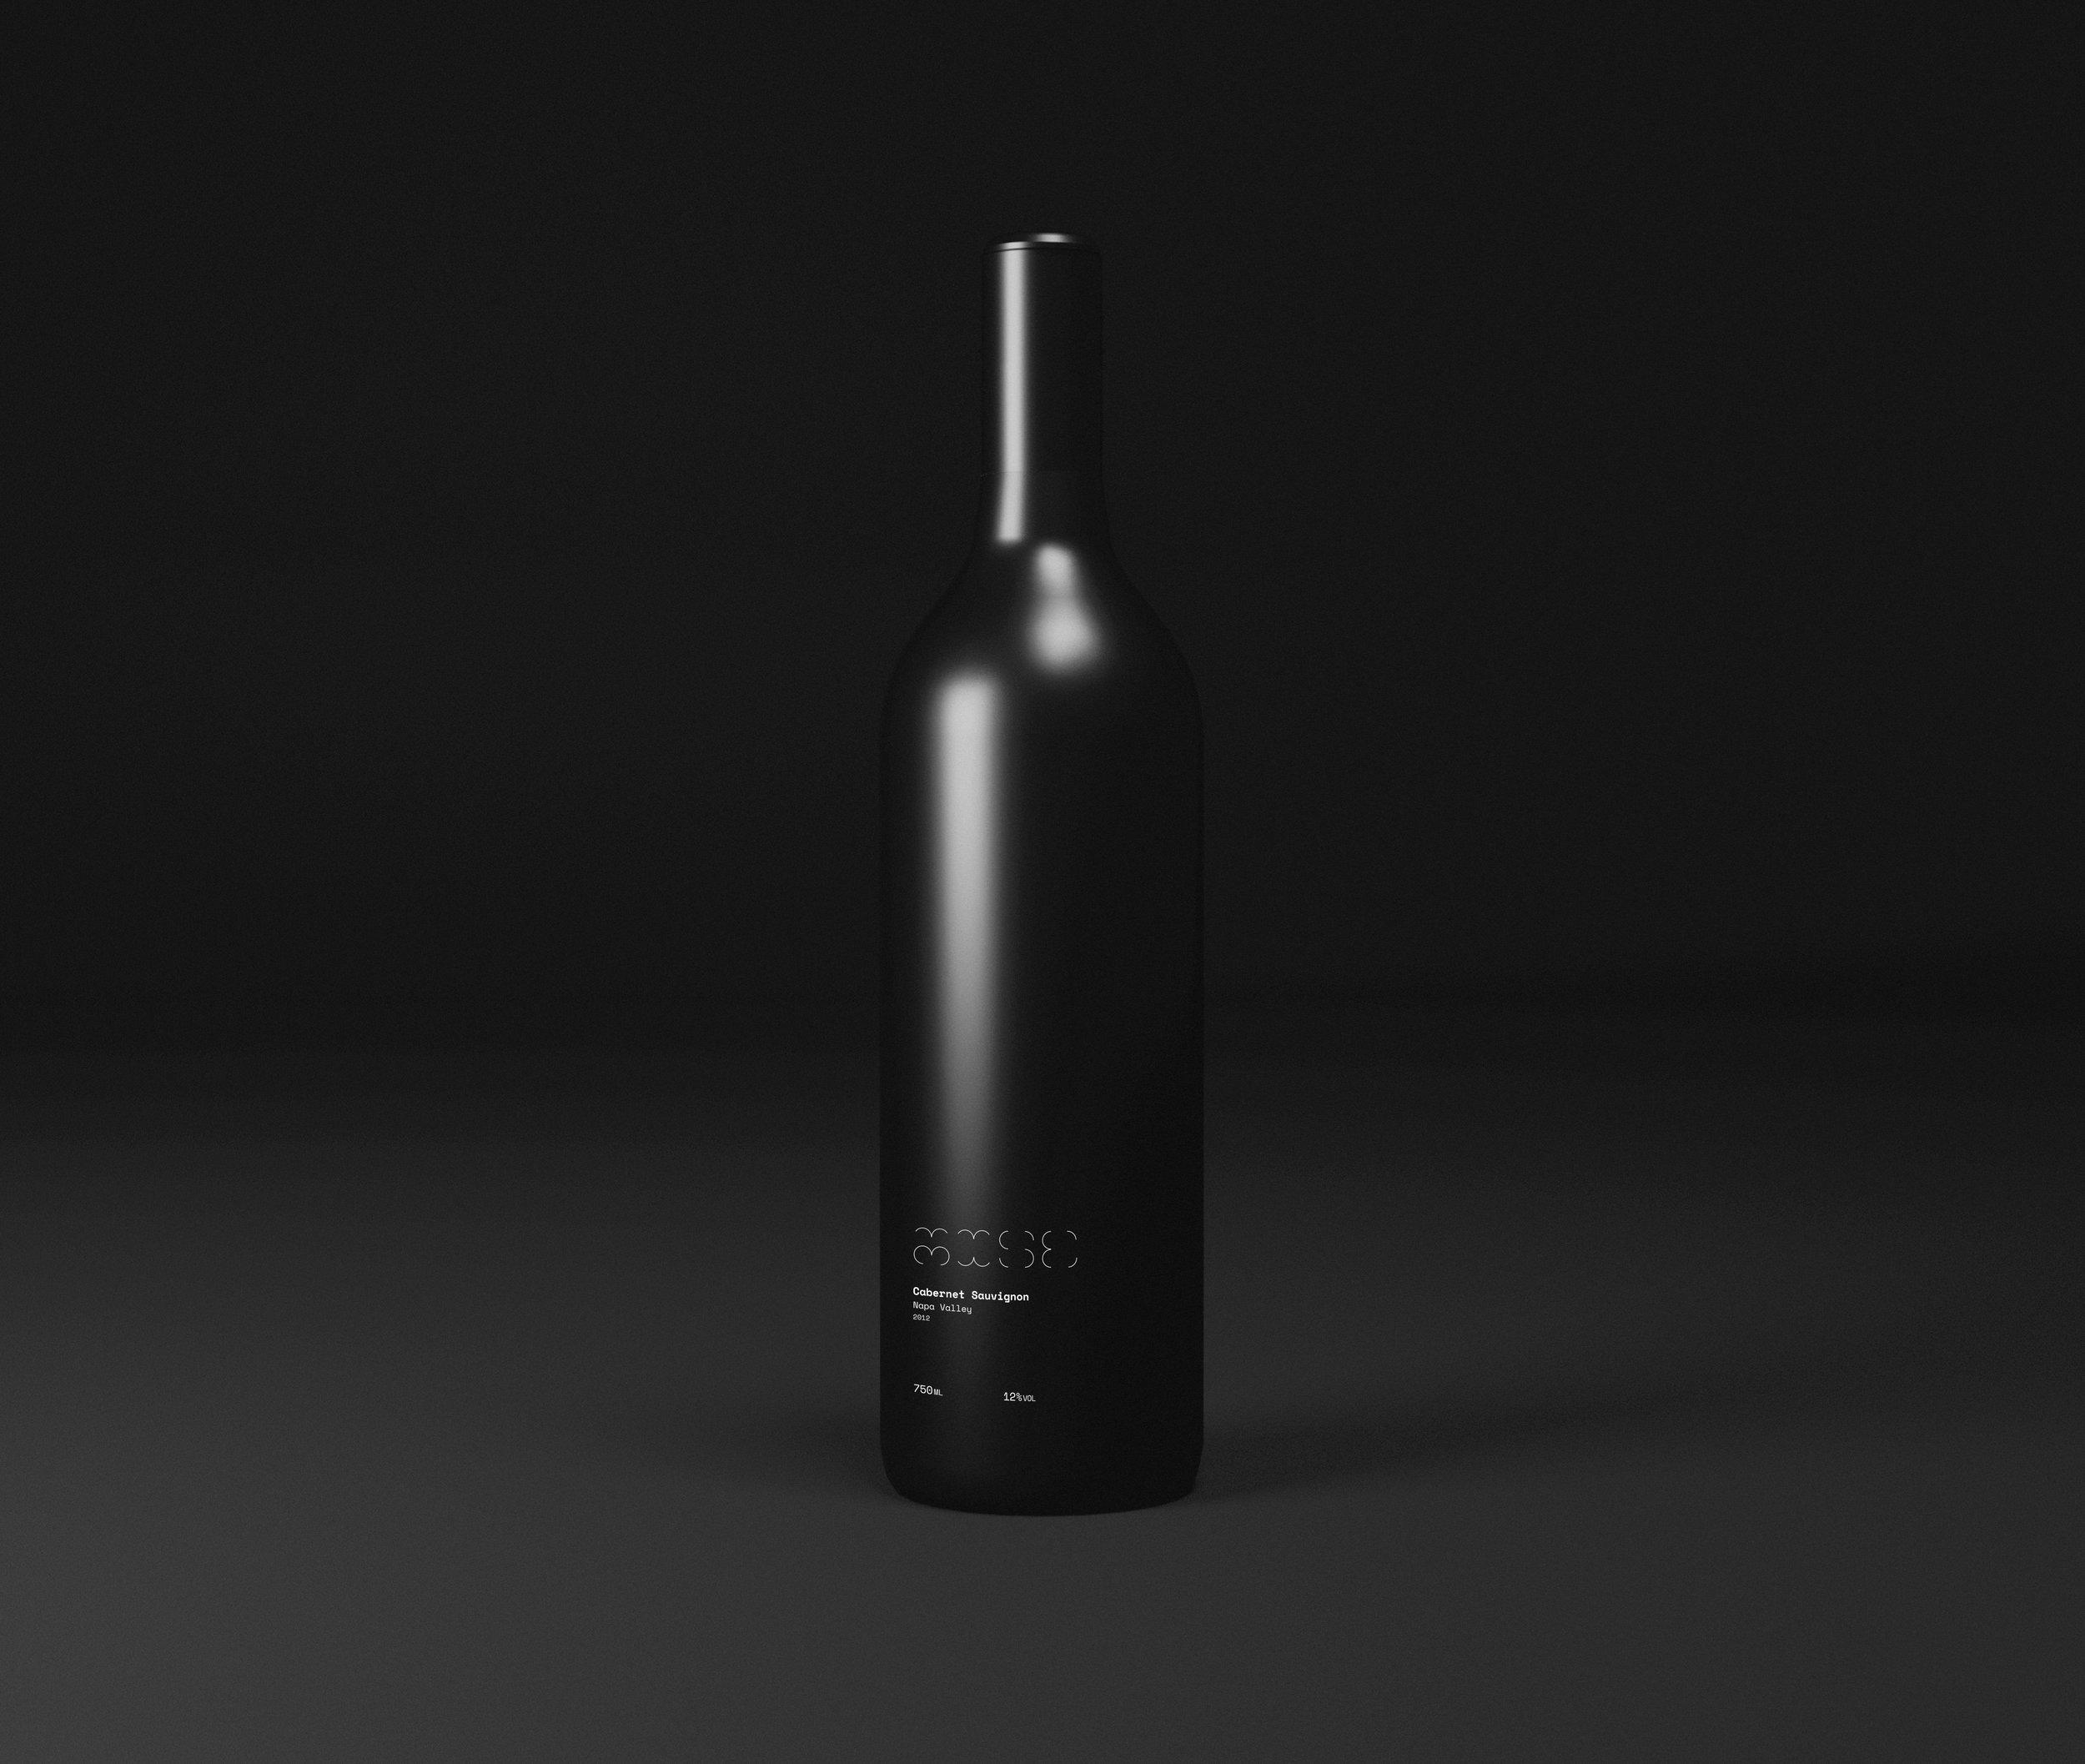 Black bottle mockup portrait.jpg